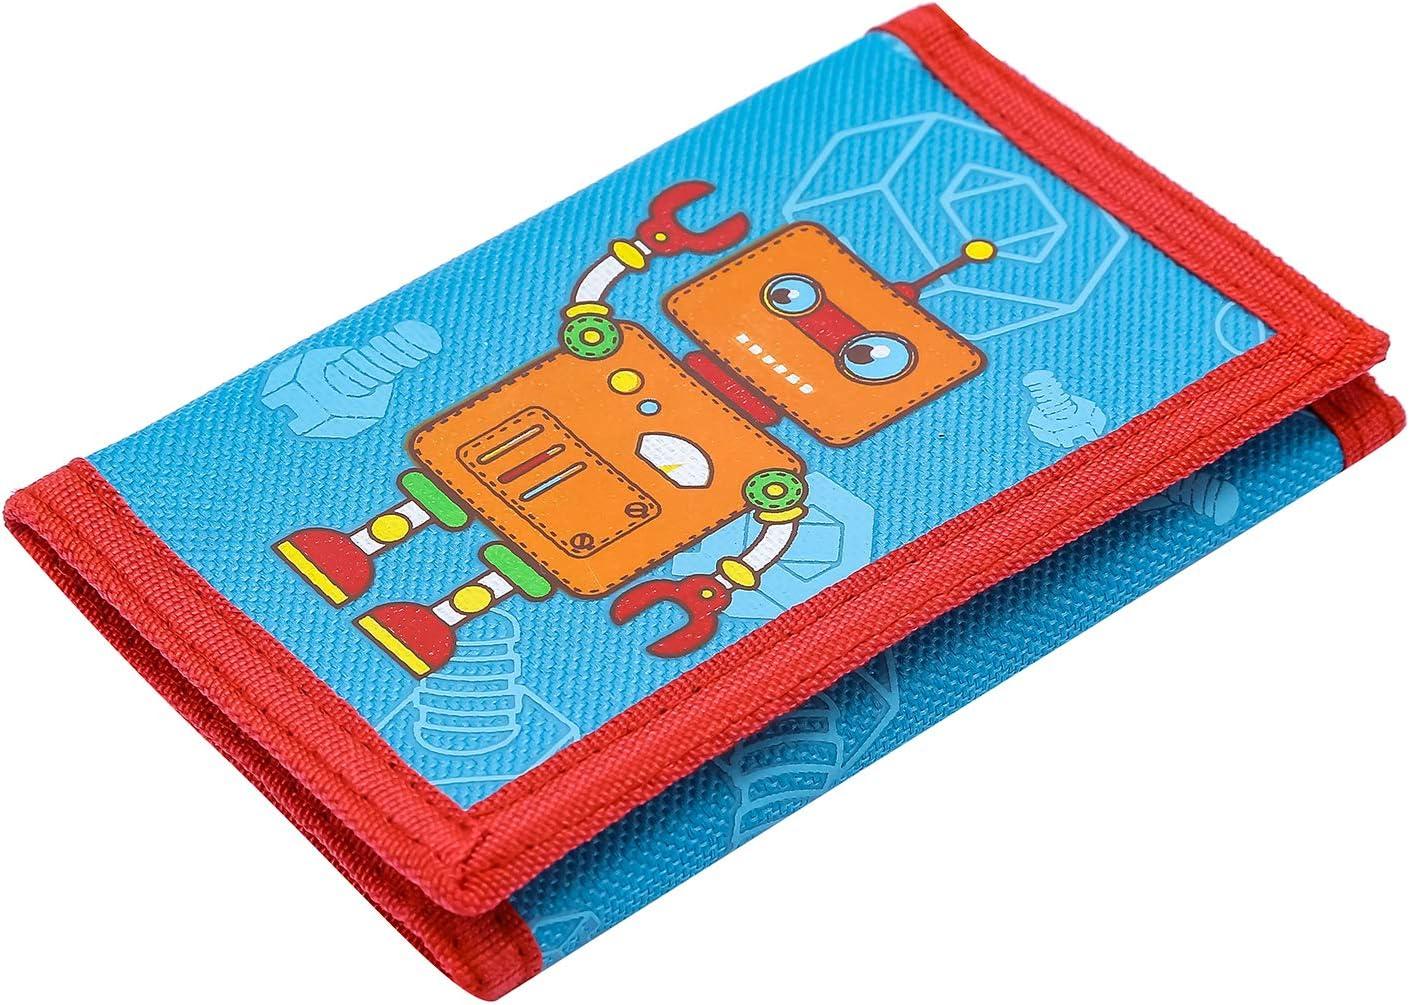 Cute Cartoon Wallet with Zipper for Kids Blue Owl RFID Wallet